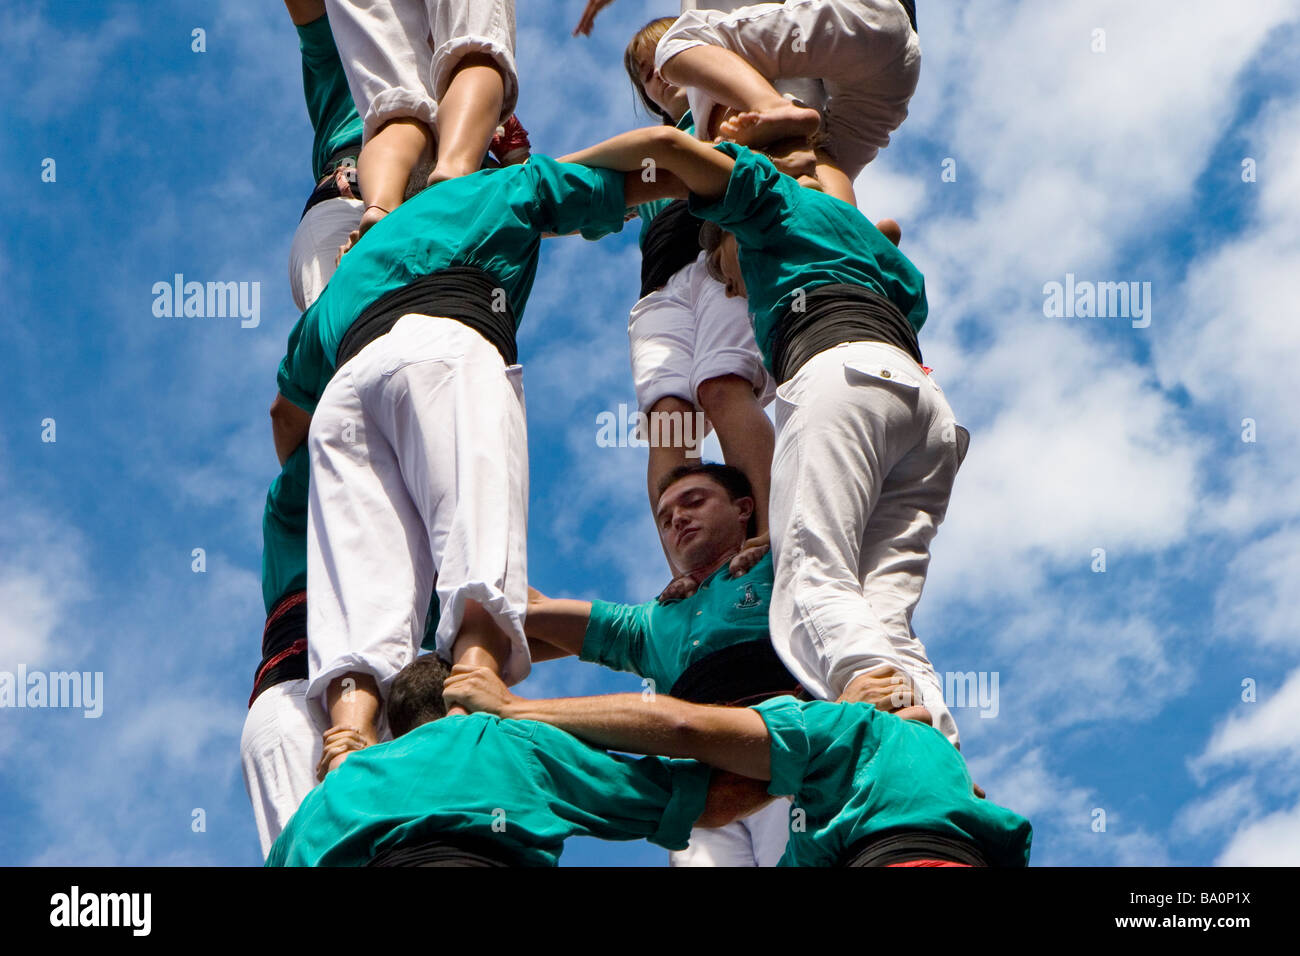 Castellers Competition during the La Merce Festival in Placa de Sant Jaume Barcelona Spain, team Vila Franca - Stock Image